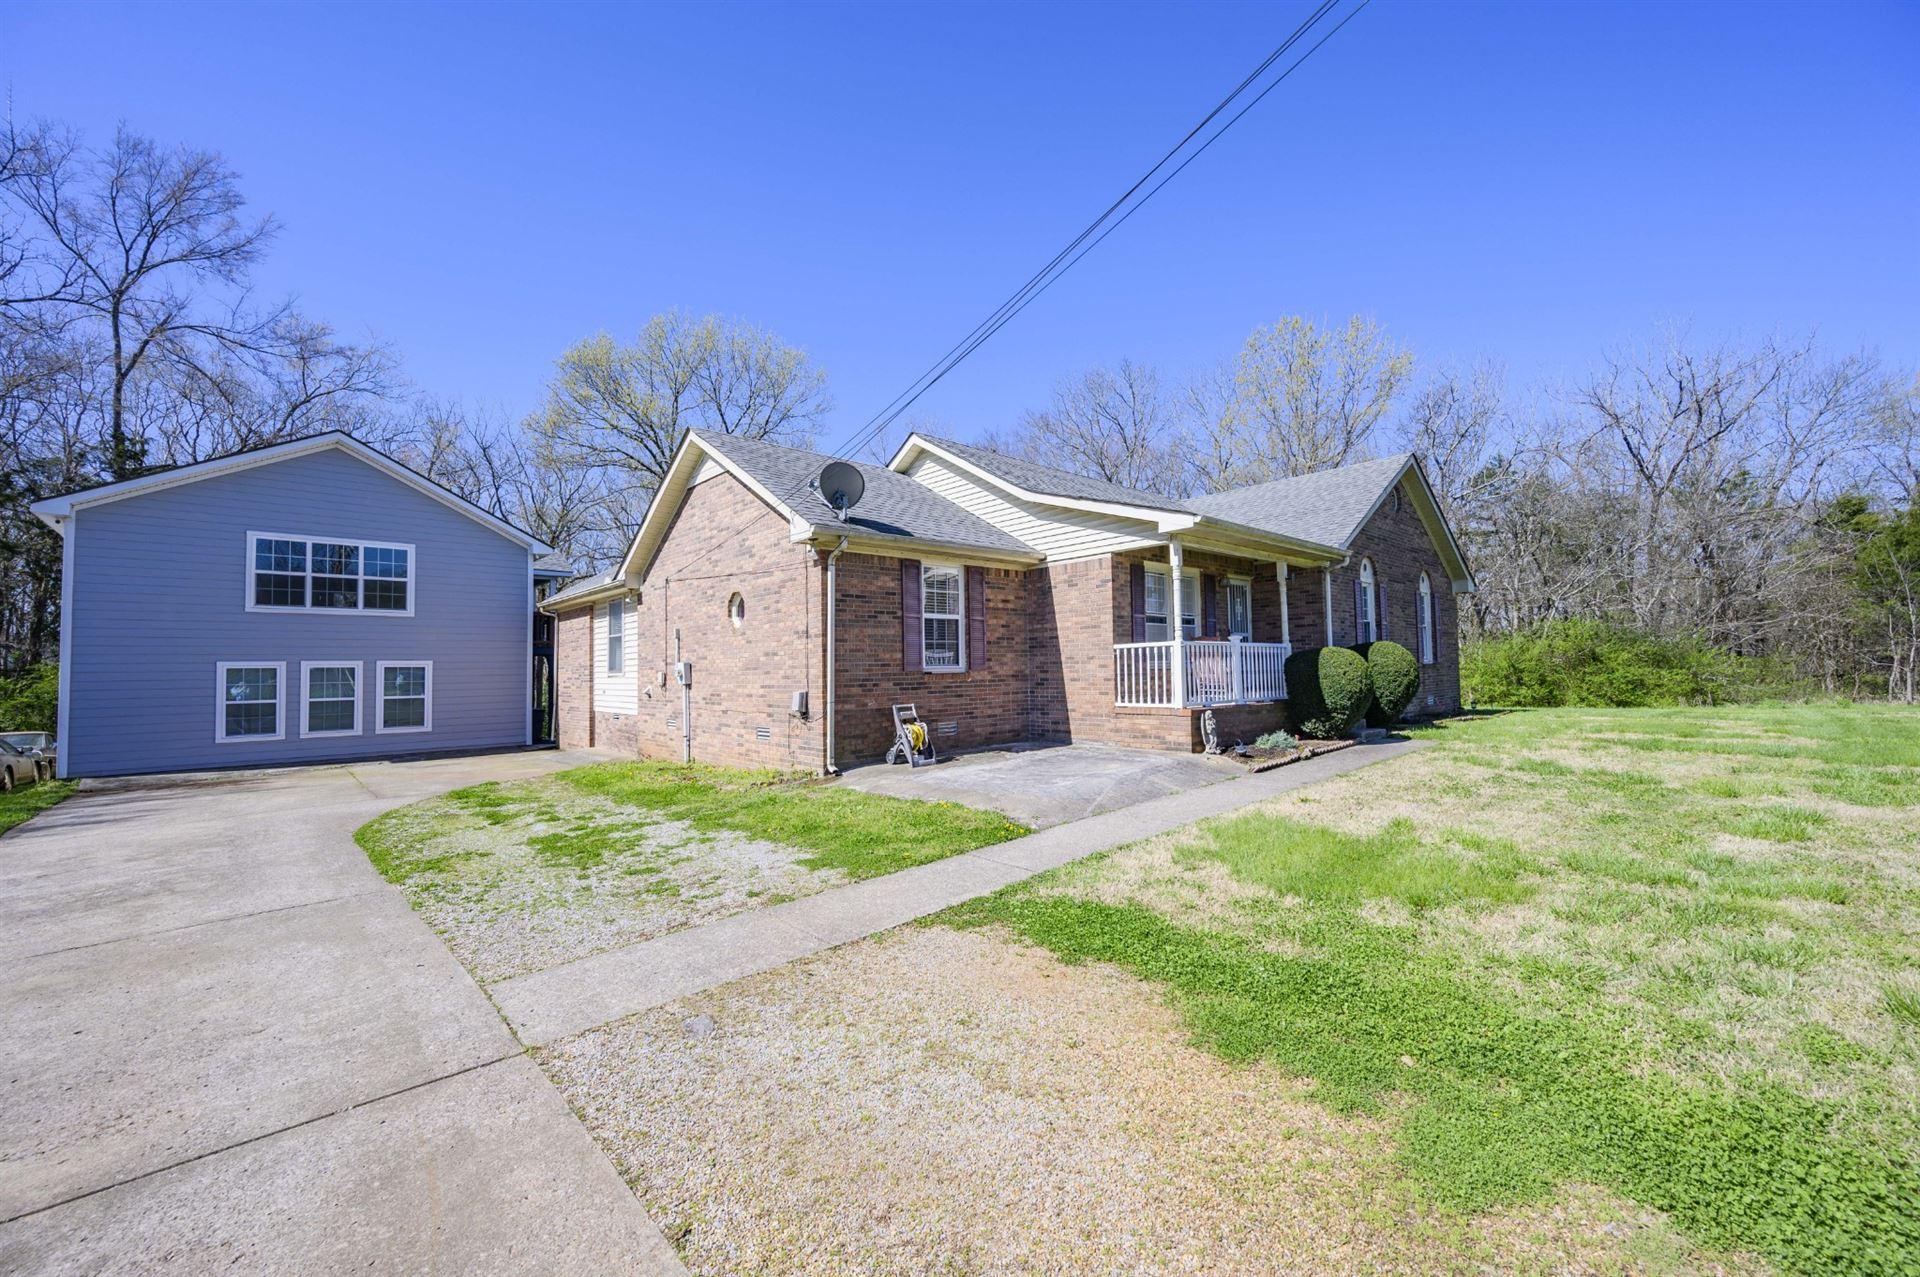 Photo of 1814 Cross Creek Dr, Murfreesboro, TN 37127 (MLS # 2242502)